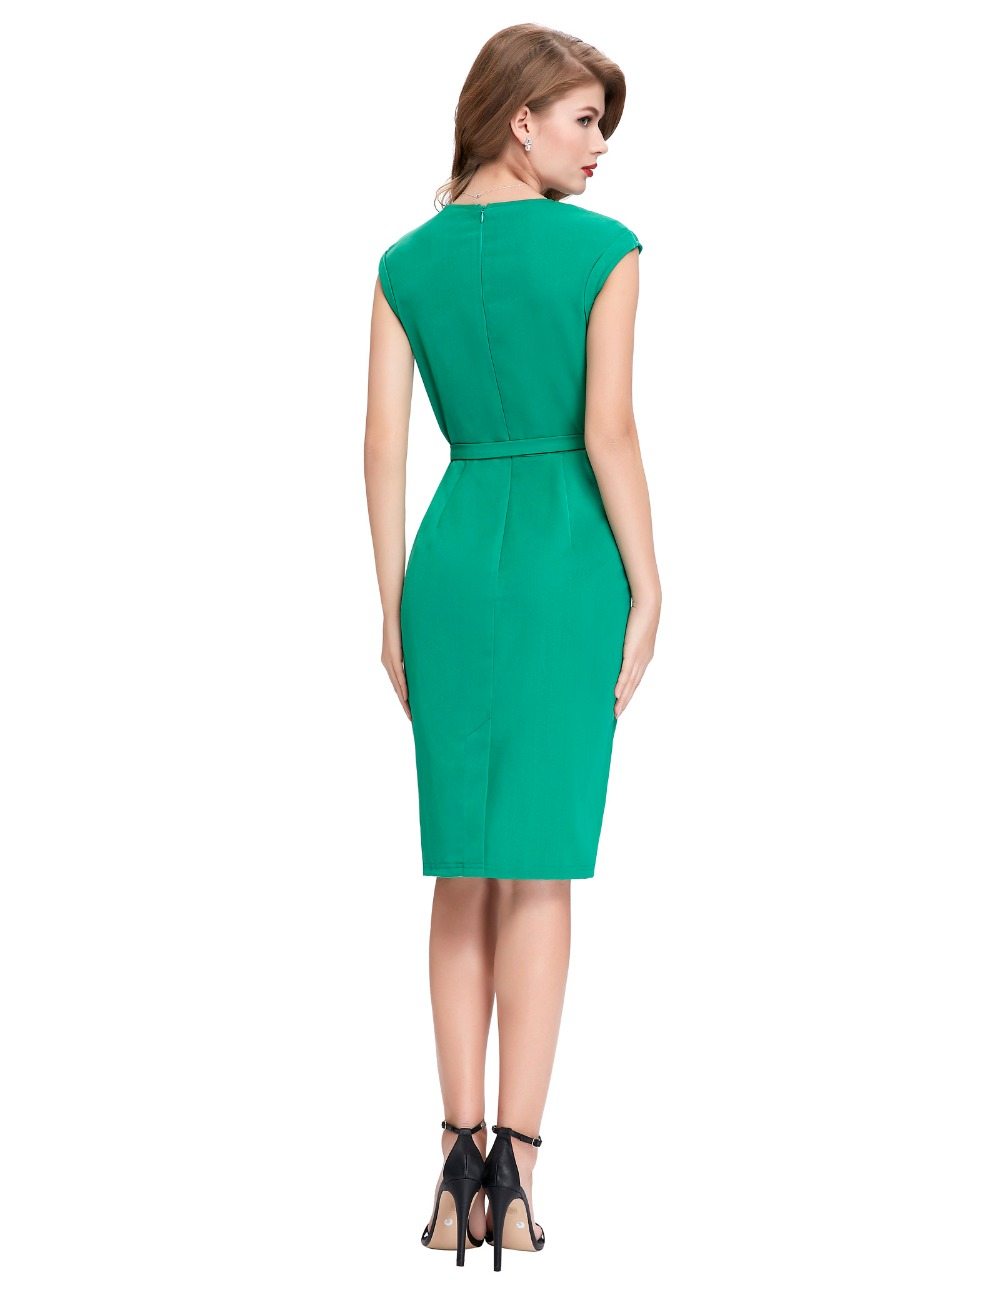 Aliexpress.com : Buy Short Prom Dresses Vintage Green Pencil Dress ...